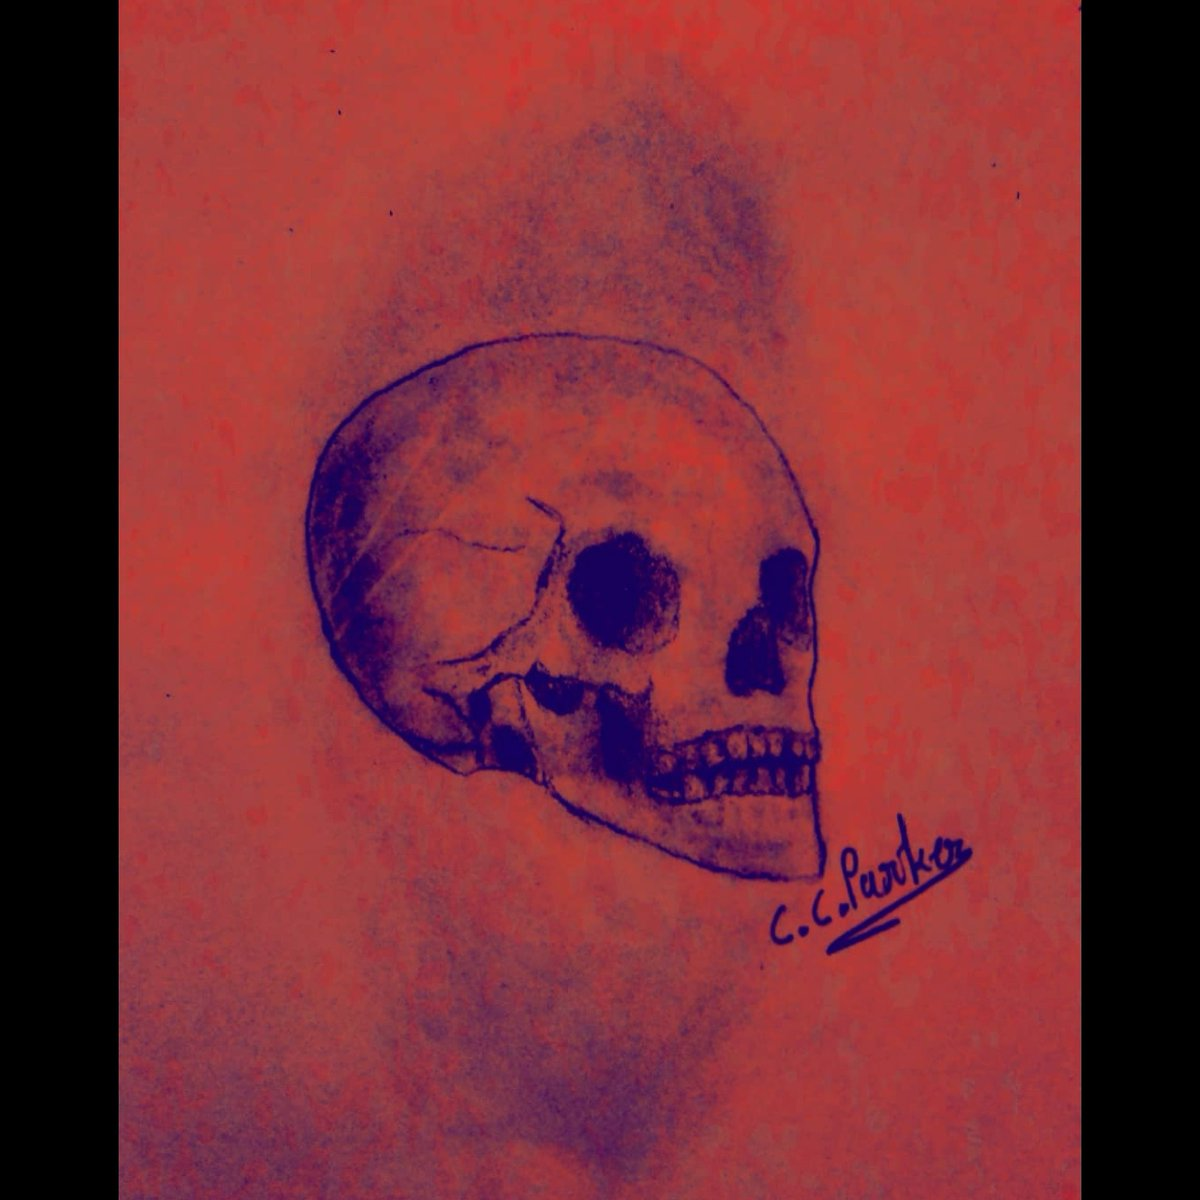 ON THE INSIDE WE'RE ALL THE SAME.#pencilartwork #skull #skullart #skulldrawing #skullartwork #pencilsketches #pencildrawings #pencilart #pencilsketch #graphiteportrait #graphitesketch #illustration #illustrationart #charcoalart #charcoalportrait #illustrationartists #happie99pic.twitter.com/Qlnarsa5xq